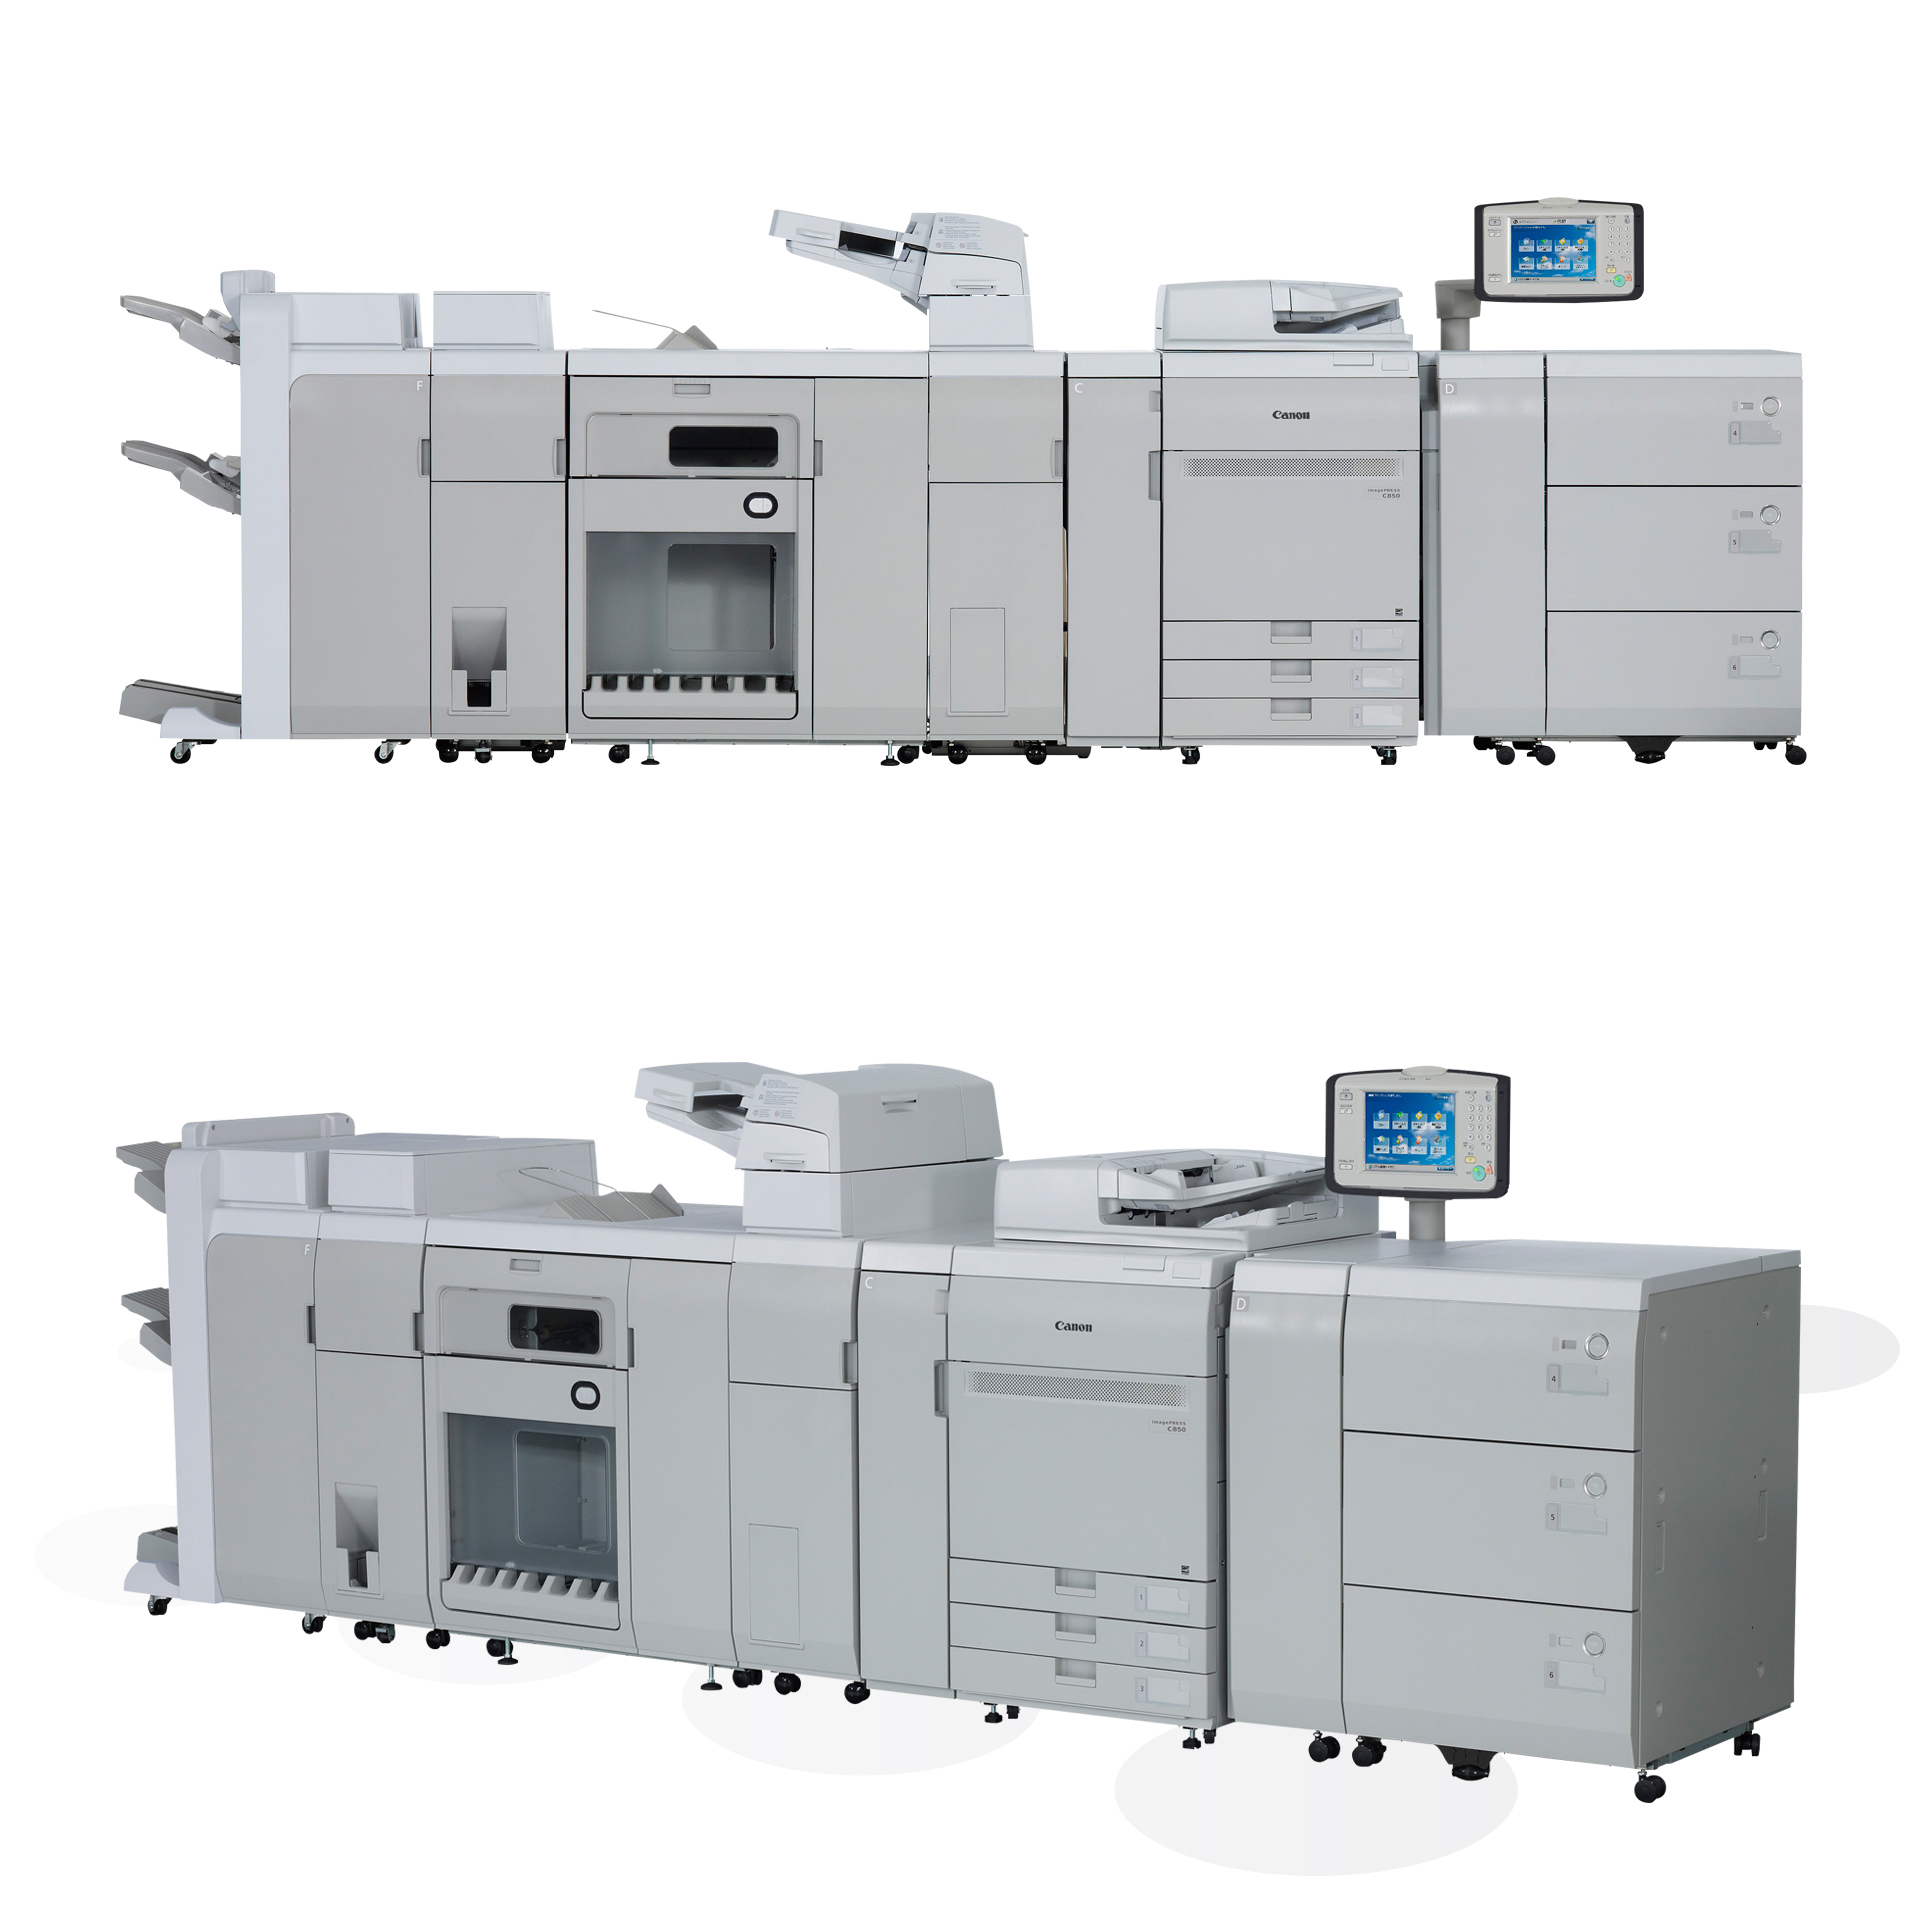 Canon imagePRESS C750/C850 Digitaldruckmaschine Vollausstattung